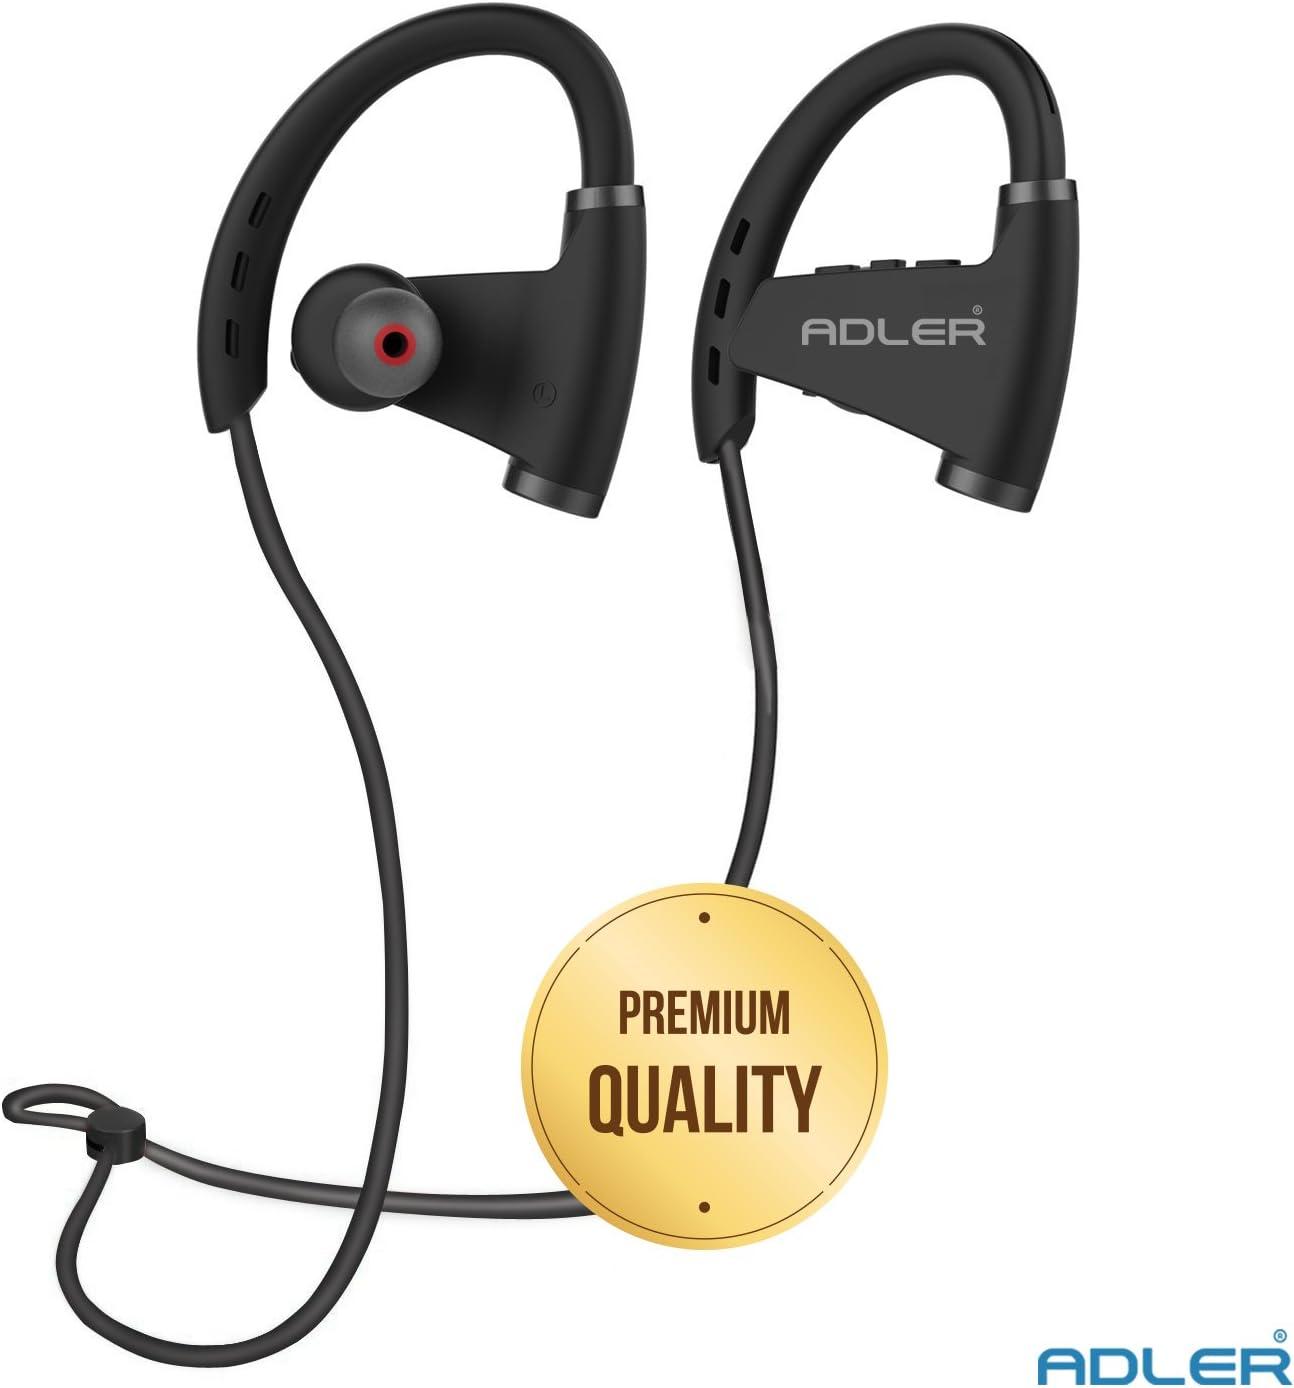 Adler GX-710 Sweatproof Wireless Earphones Bluetooth 4.1 Exercise Earphones with Microphone Support Black Red